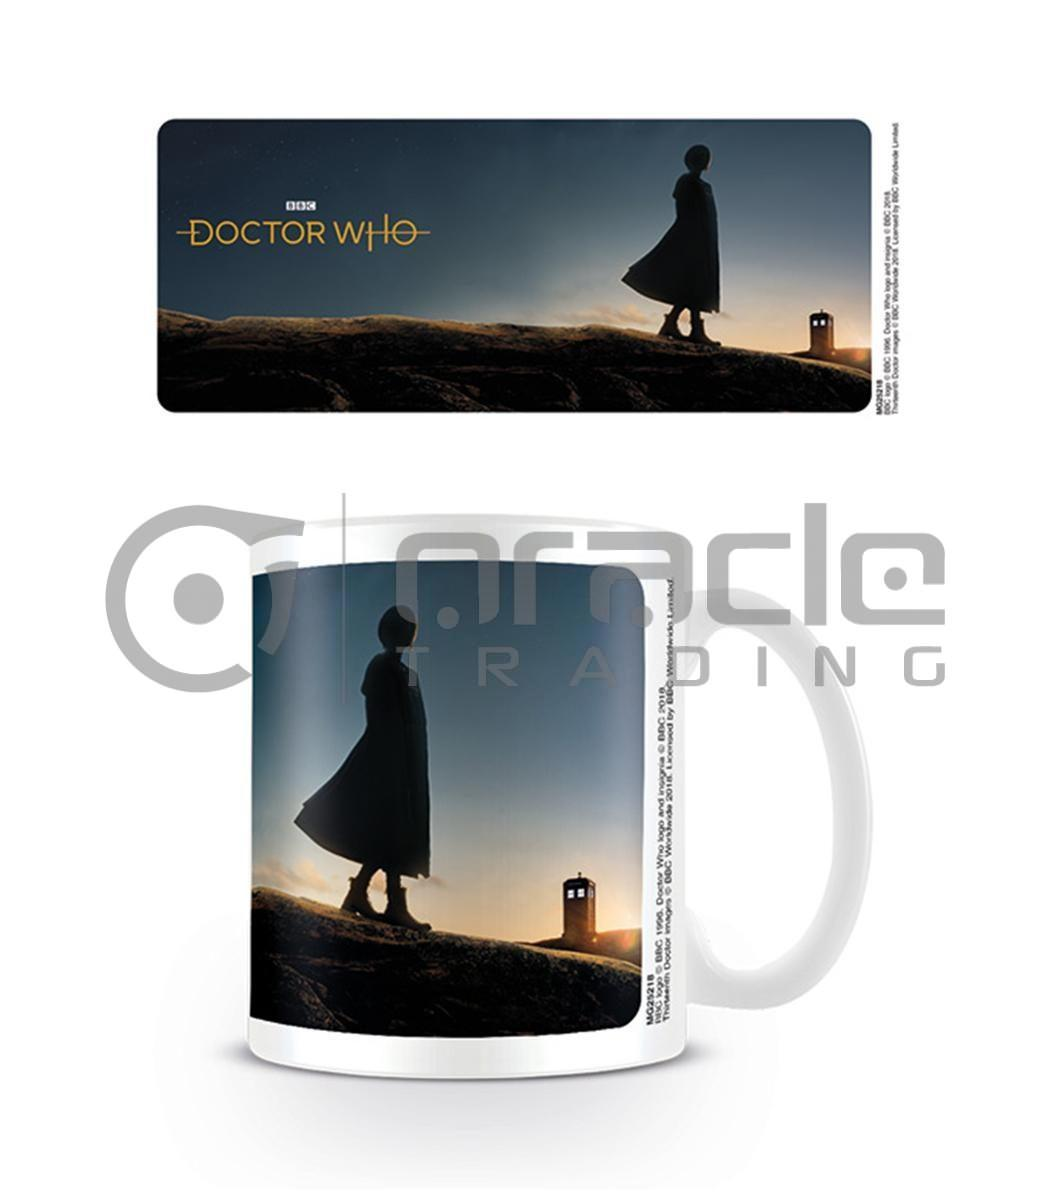 Doctor Who New Dawn Coffee Mug (13th Doctor)